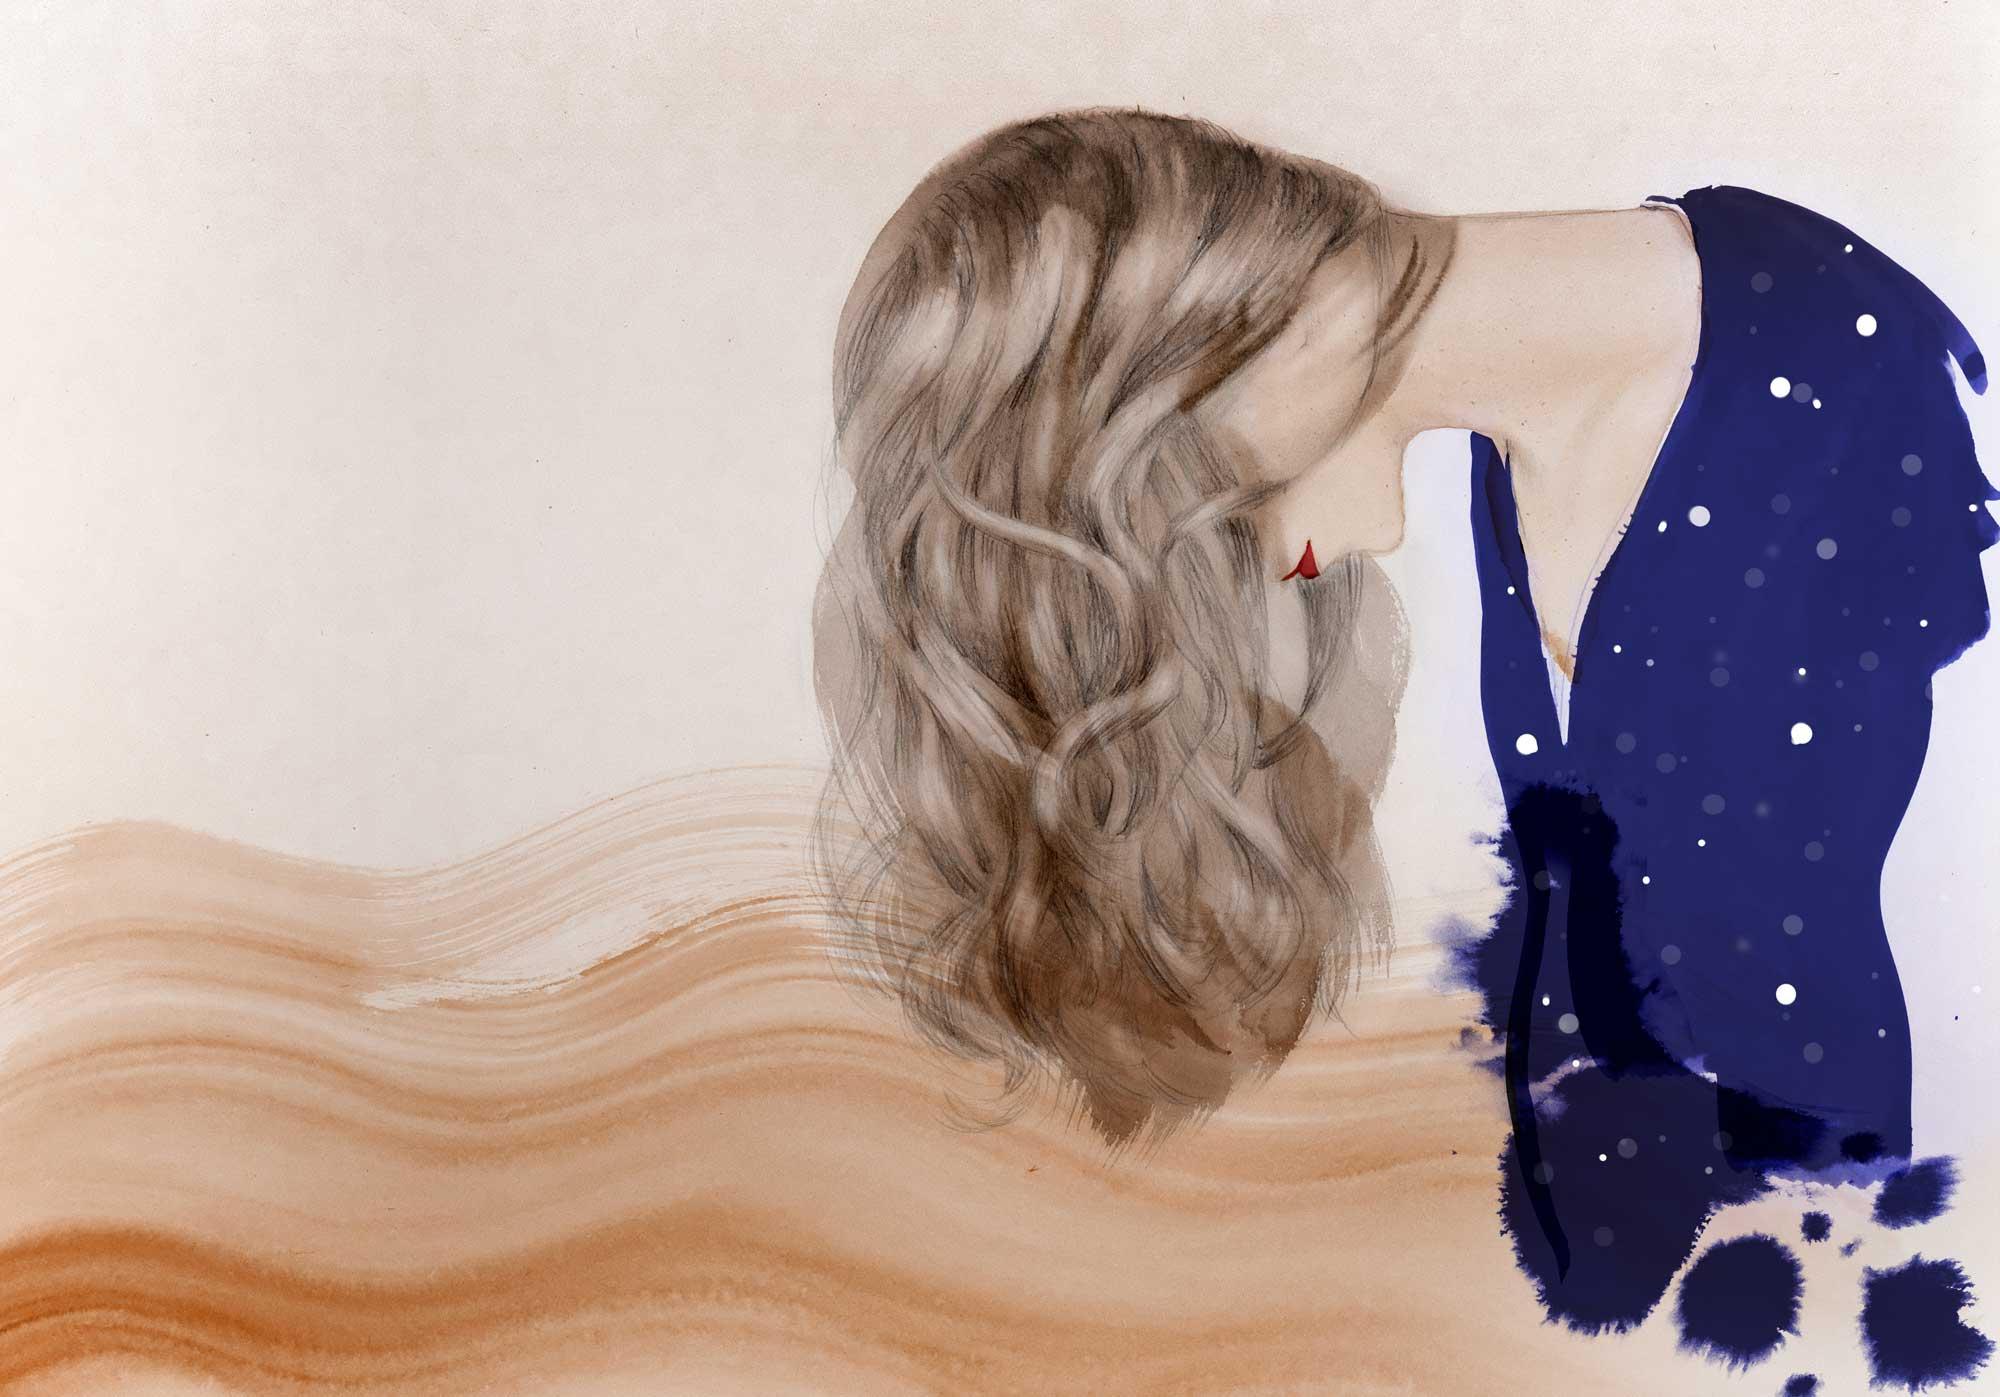 Hair forward